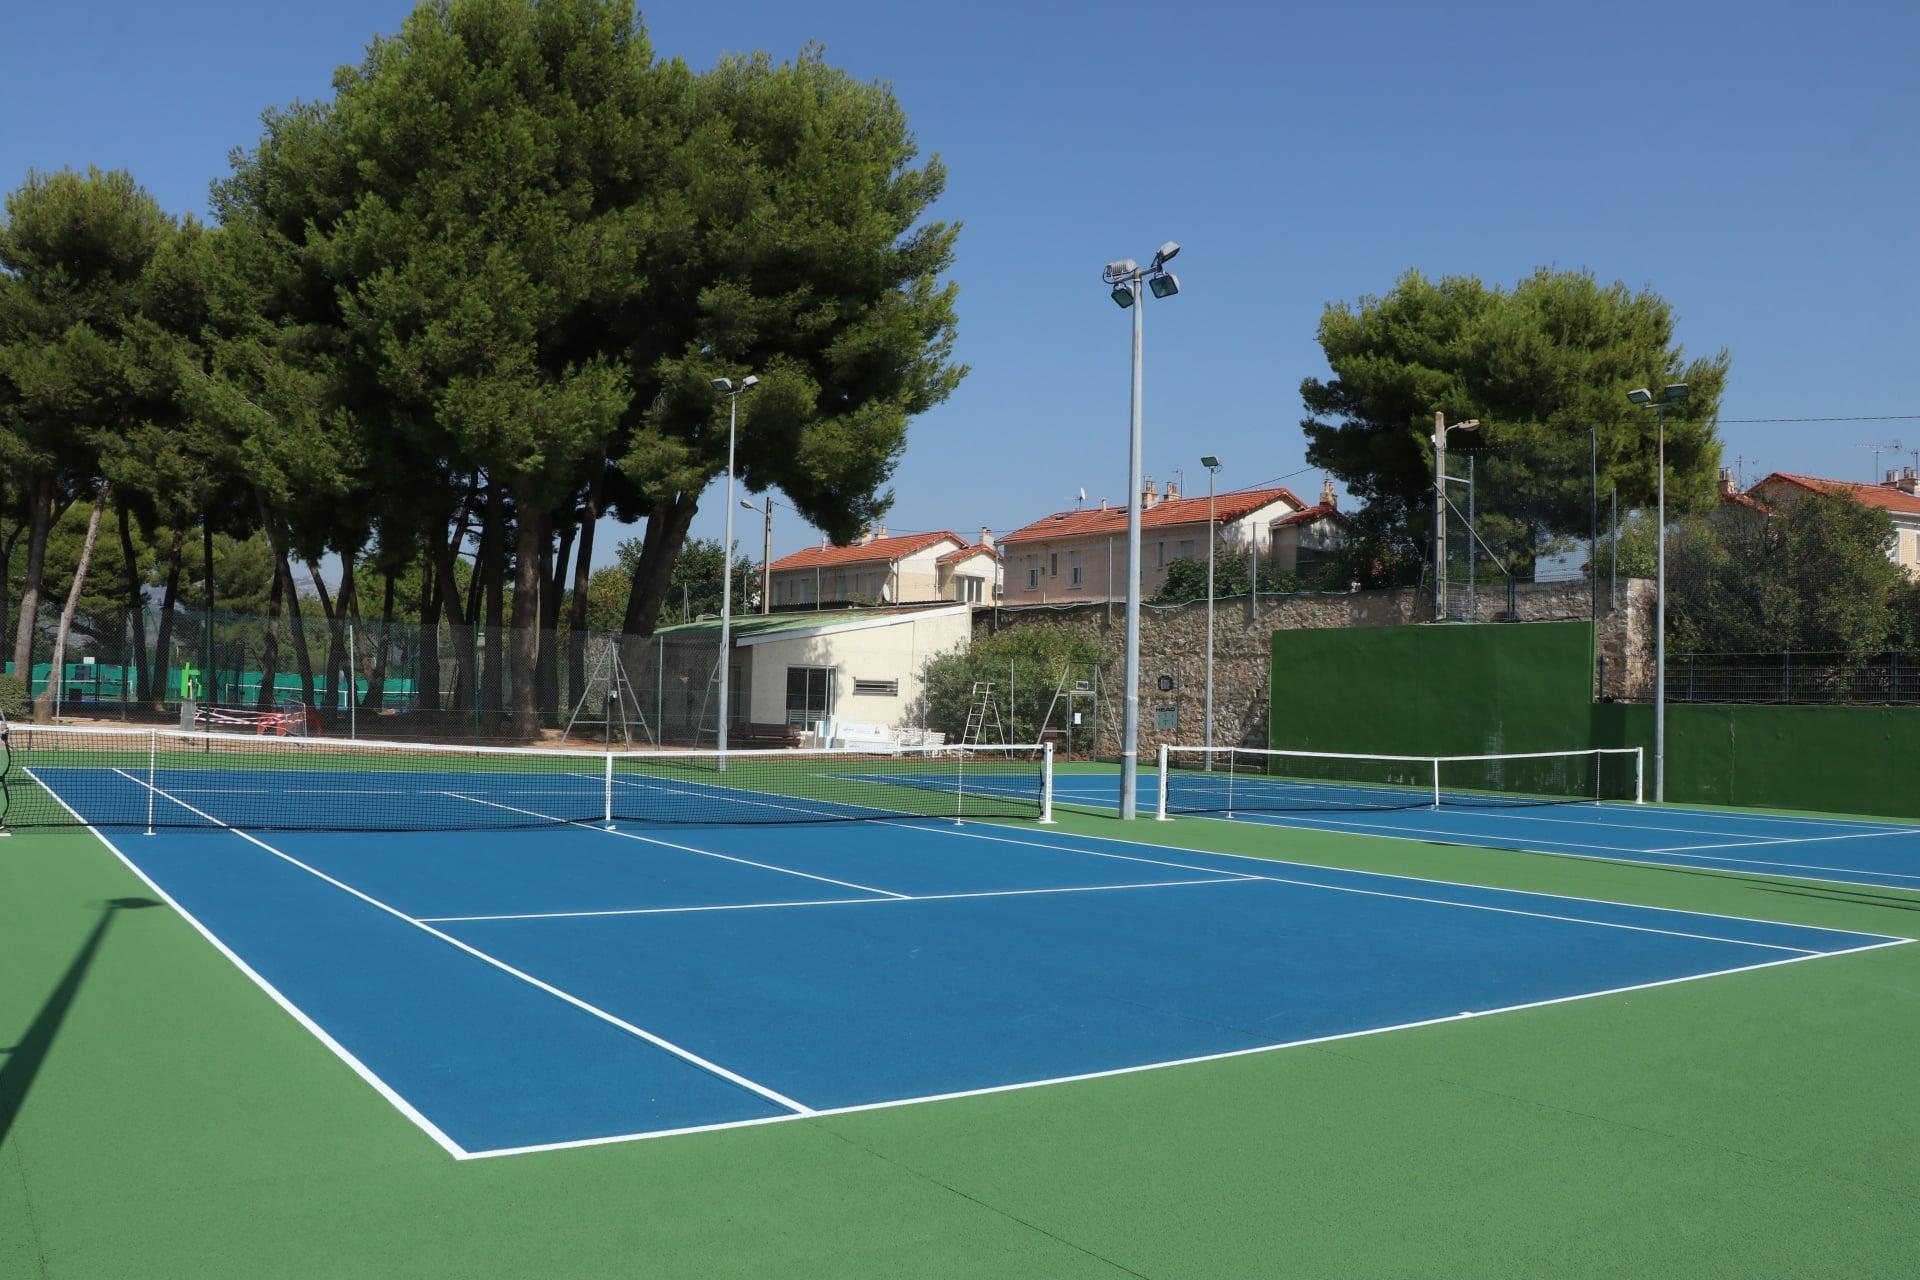 Allaudien tennis club